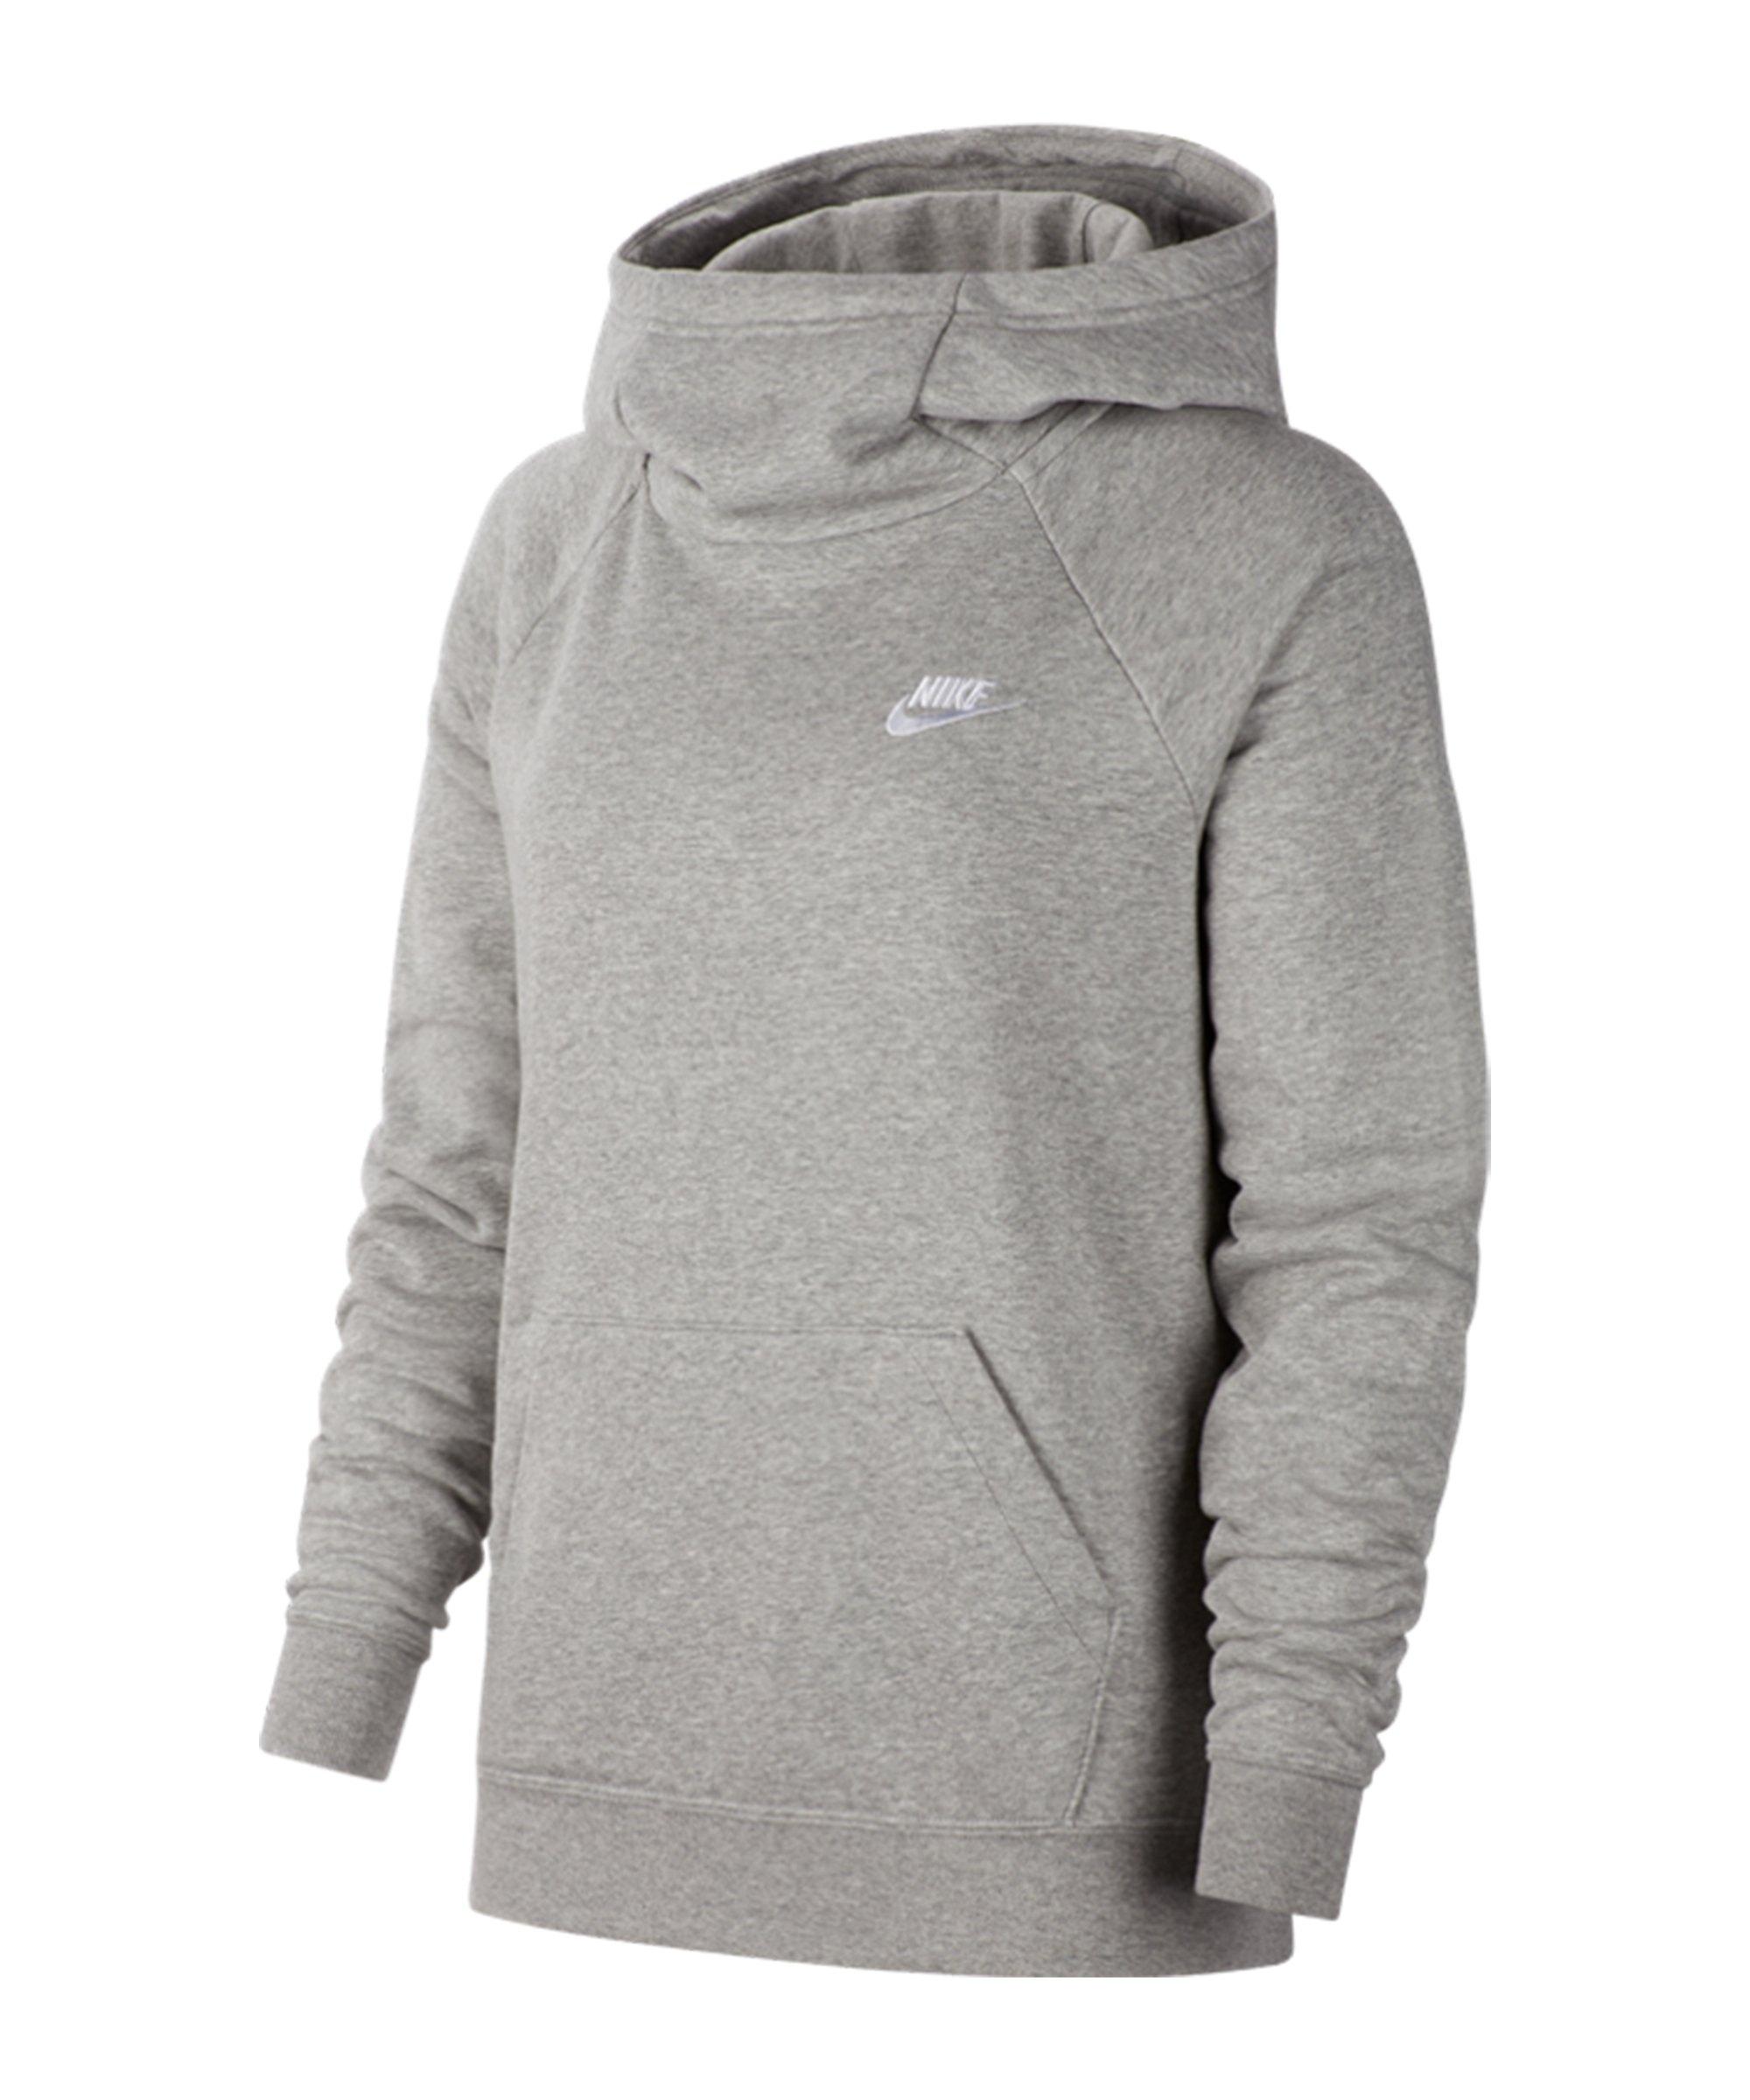 Nike Essential Hoody Damen Grau F063 - grau